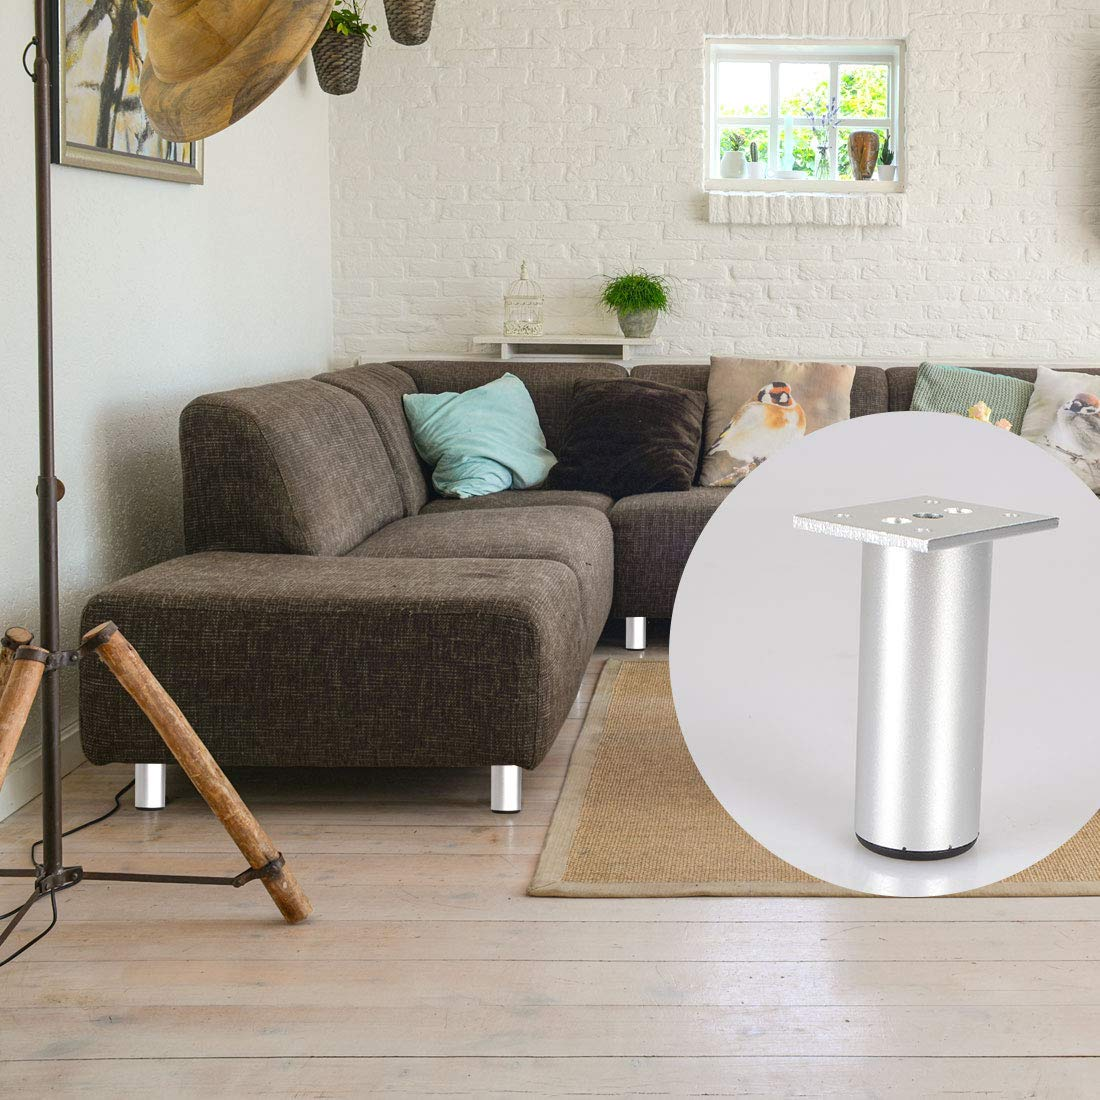 La Vane Set of 4 Aluminium Plinth Adjustable Cabinet Feet Matte Black for Cupboard Sofa Kitchen Couch Bookcase 30cm Furniture Legs 12 inch